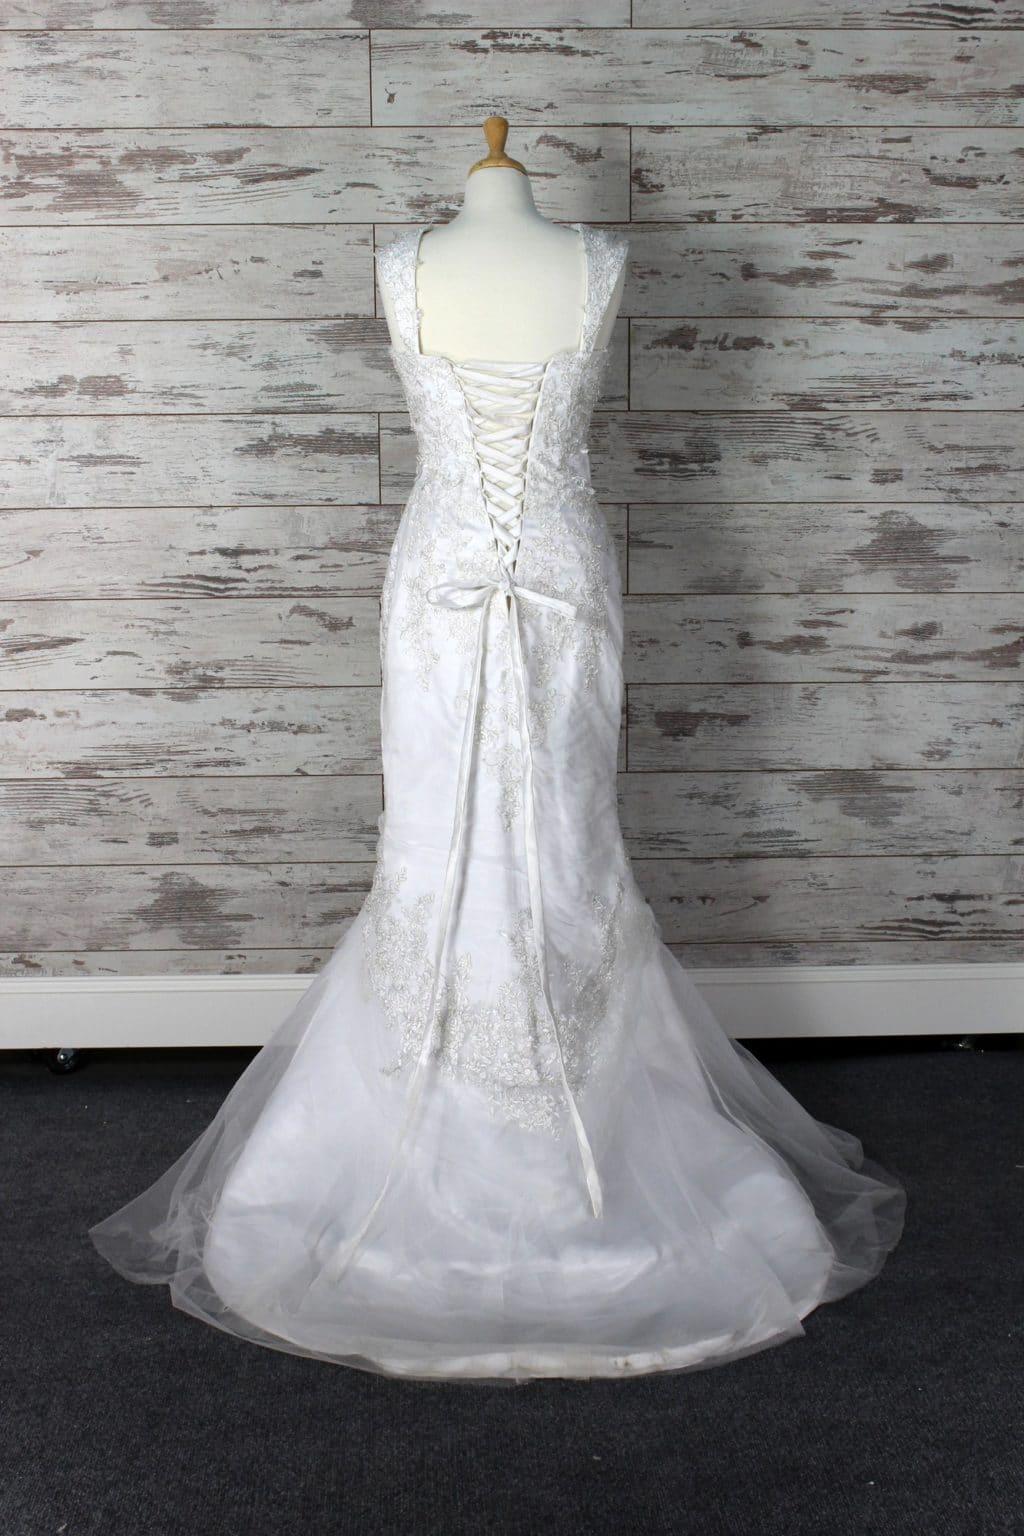 Private label mermaid wedding dress white size 8 for Private label wedding dresses